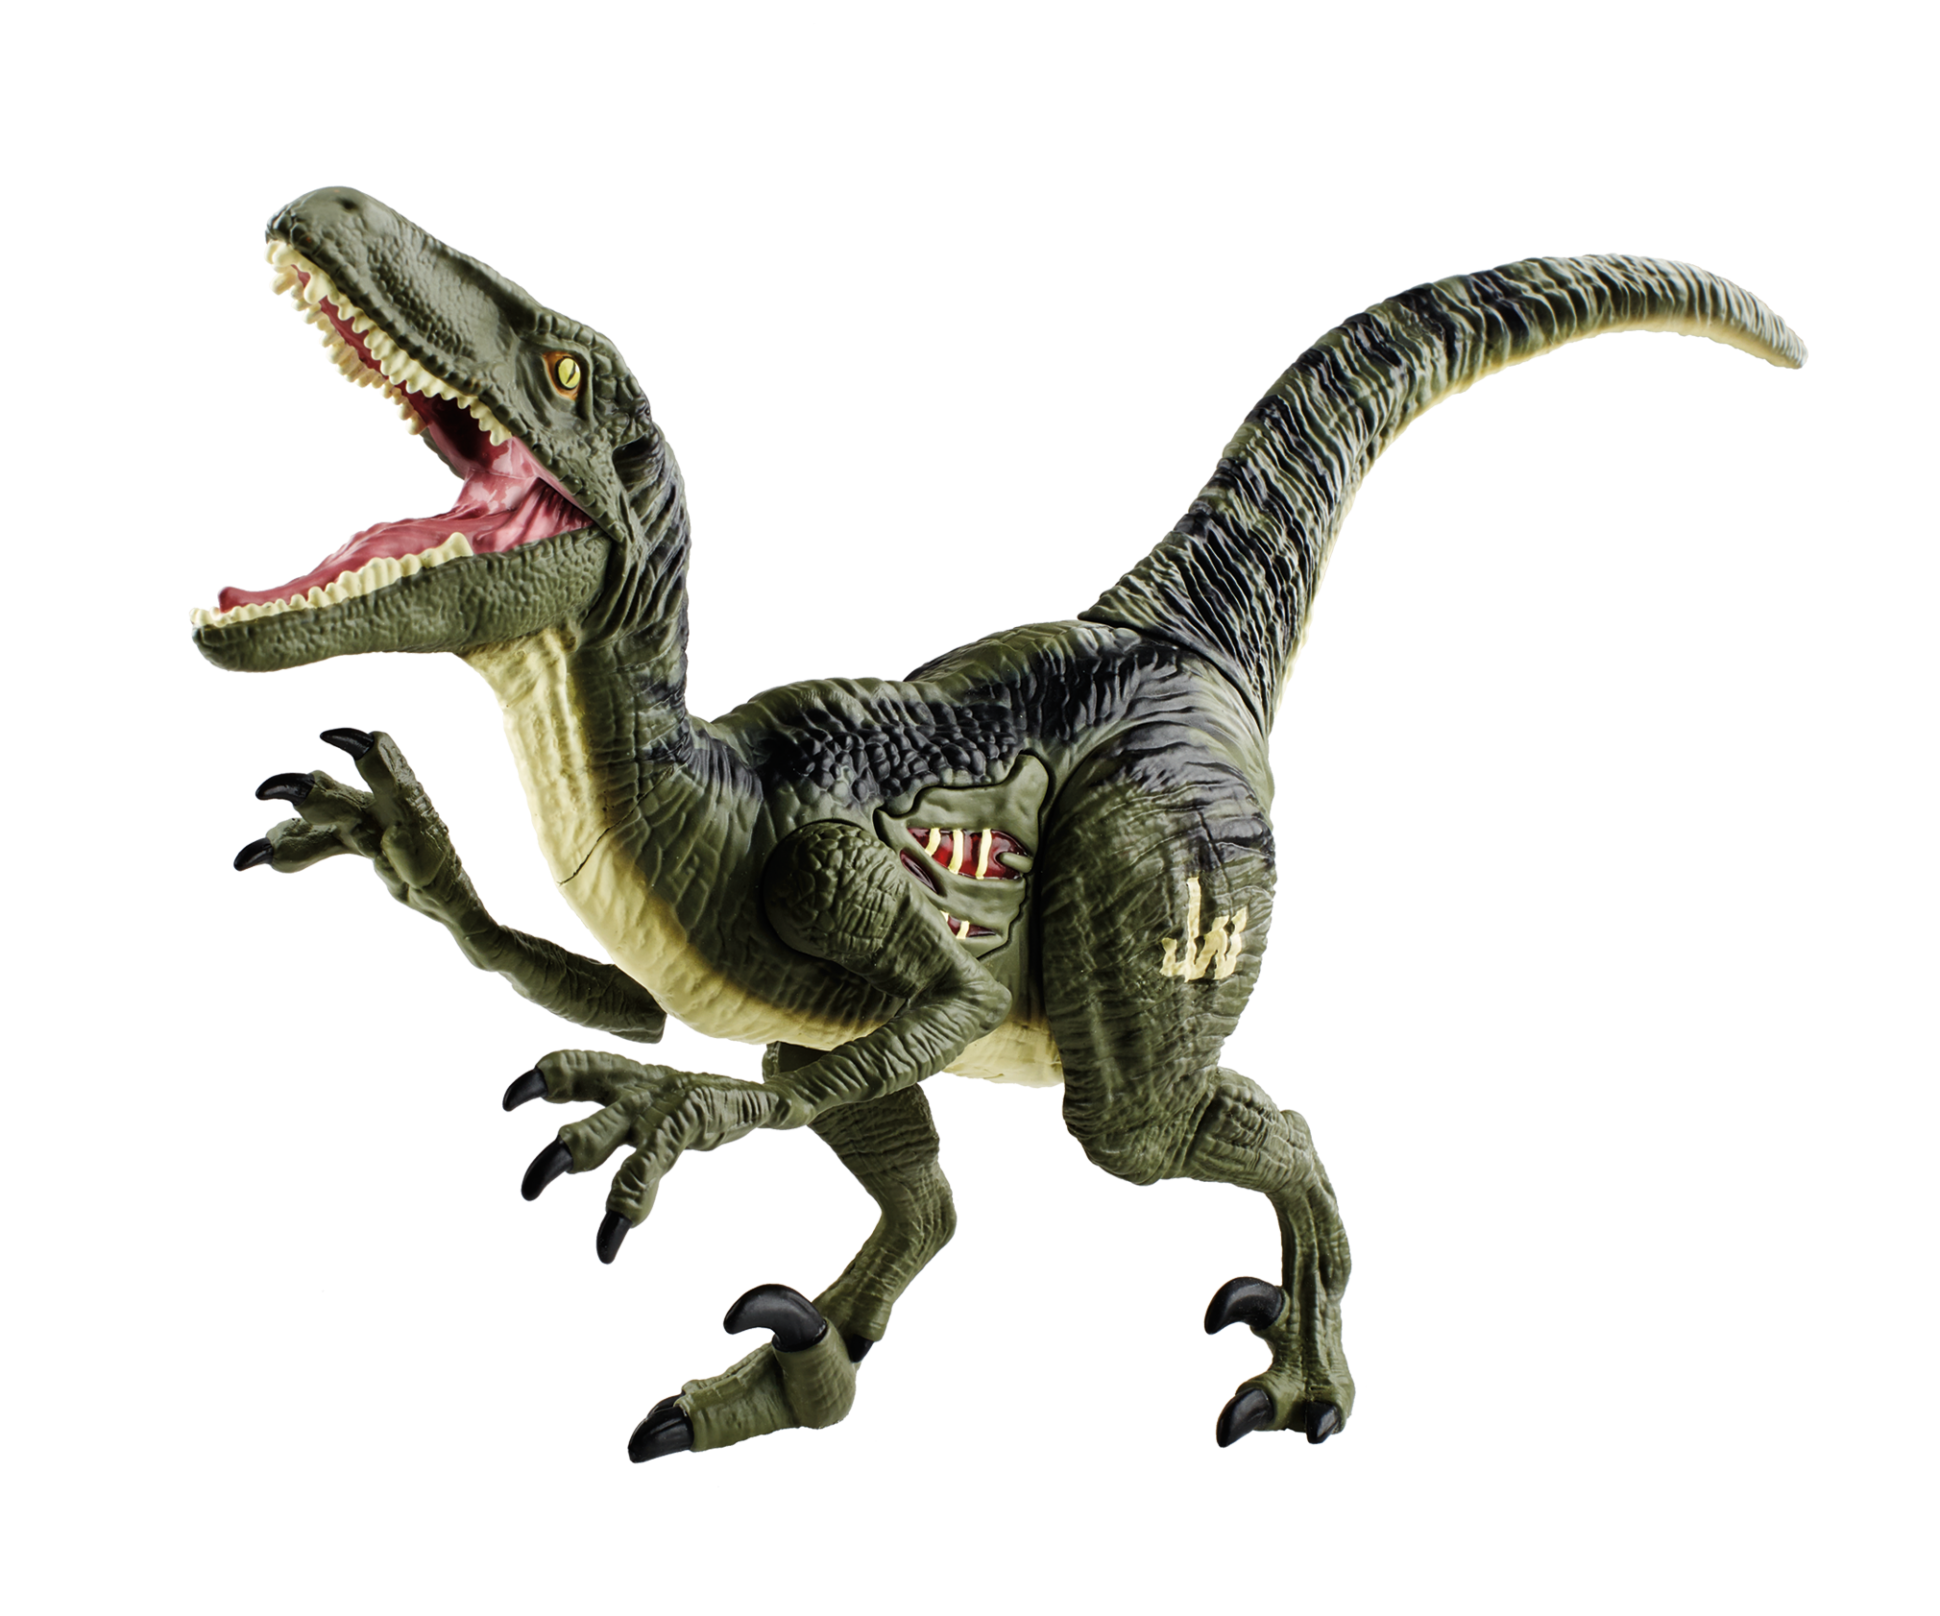 Png in high resolution. Dinosaur clipart velociraptor